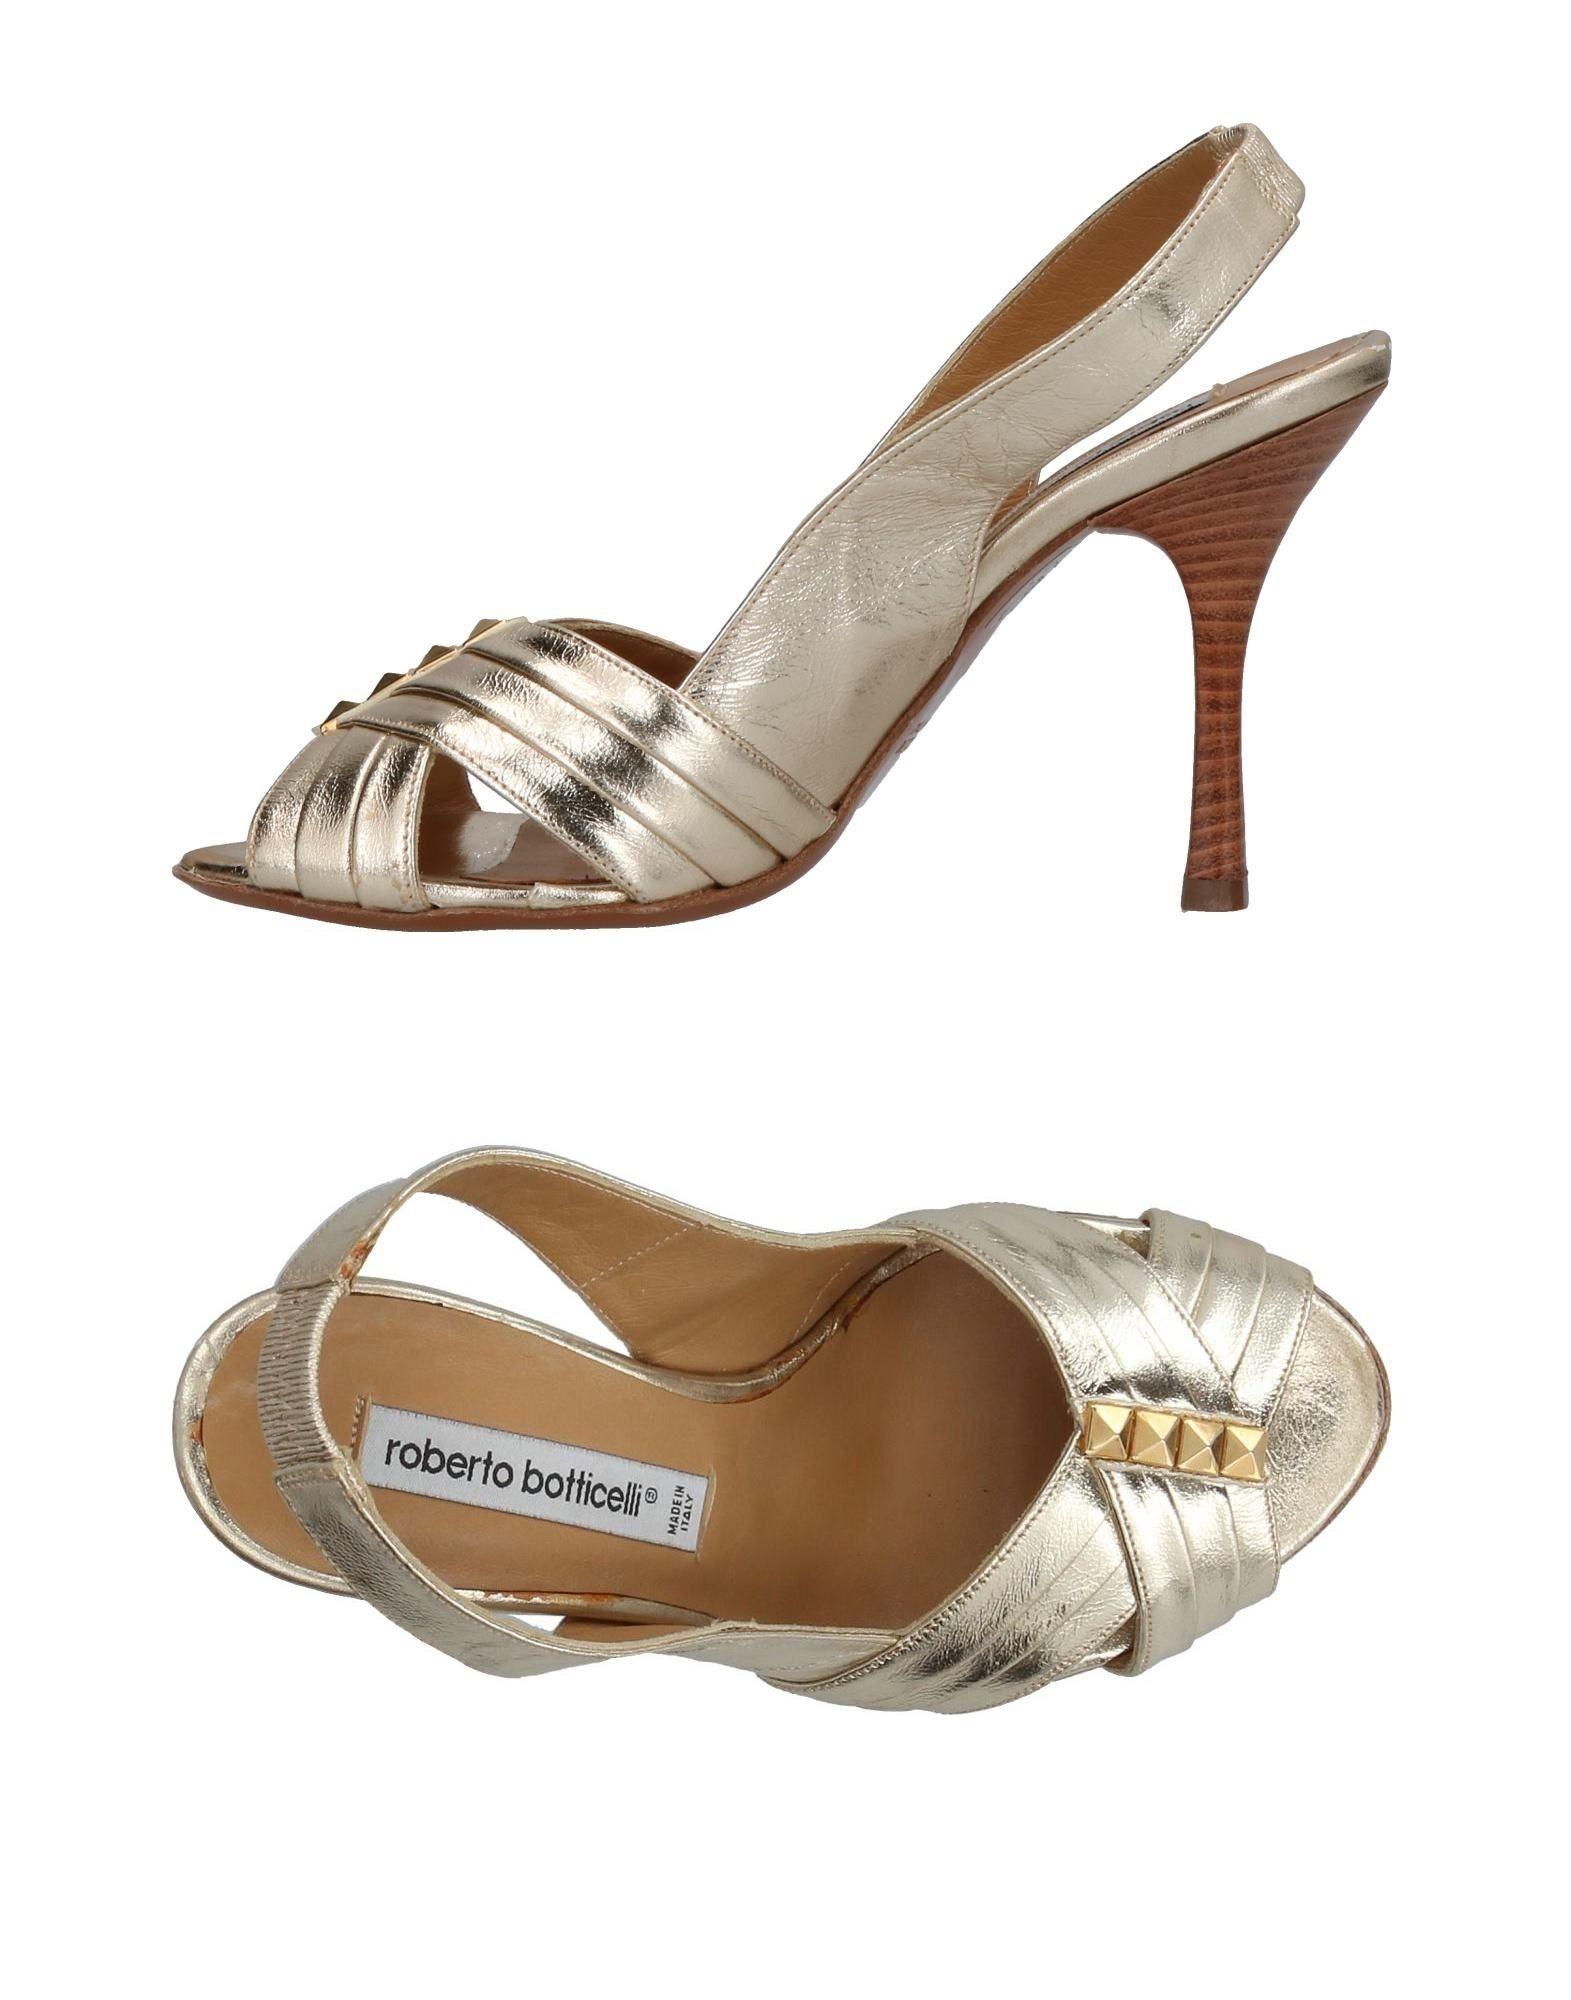 Roberto Botticelli Sandalen Damen  11375825IX Gute Qualität beliebte Schuhe